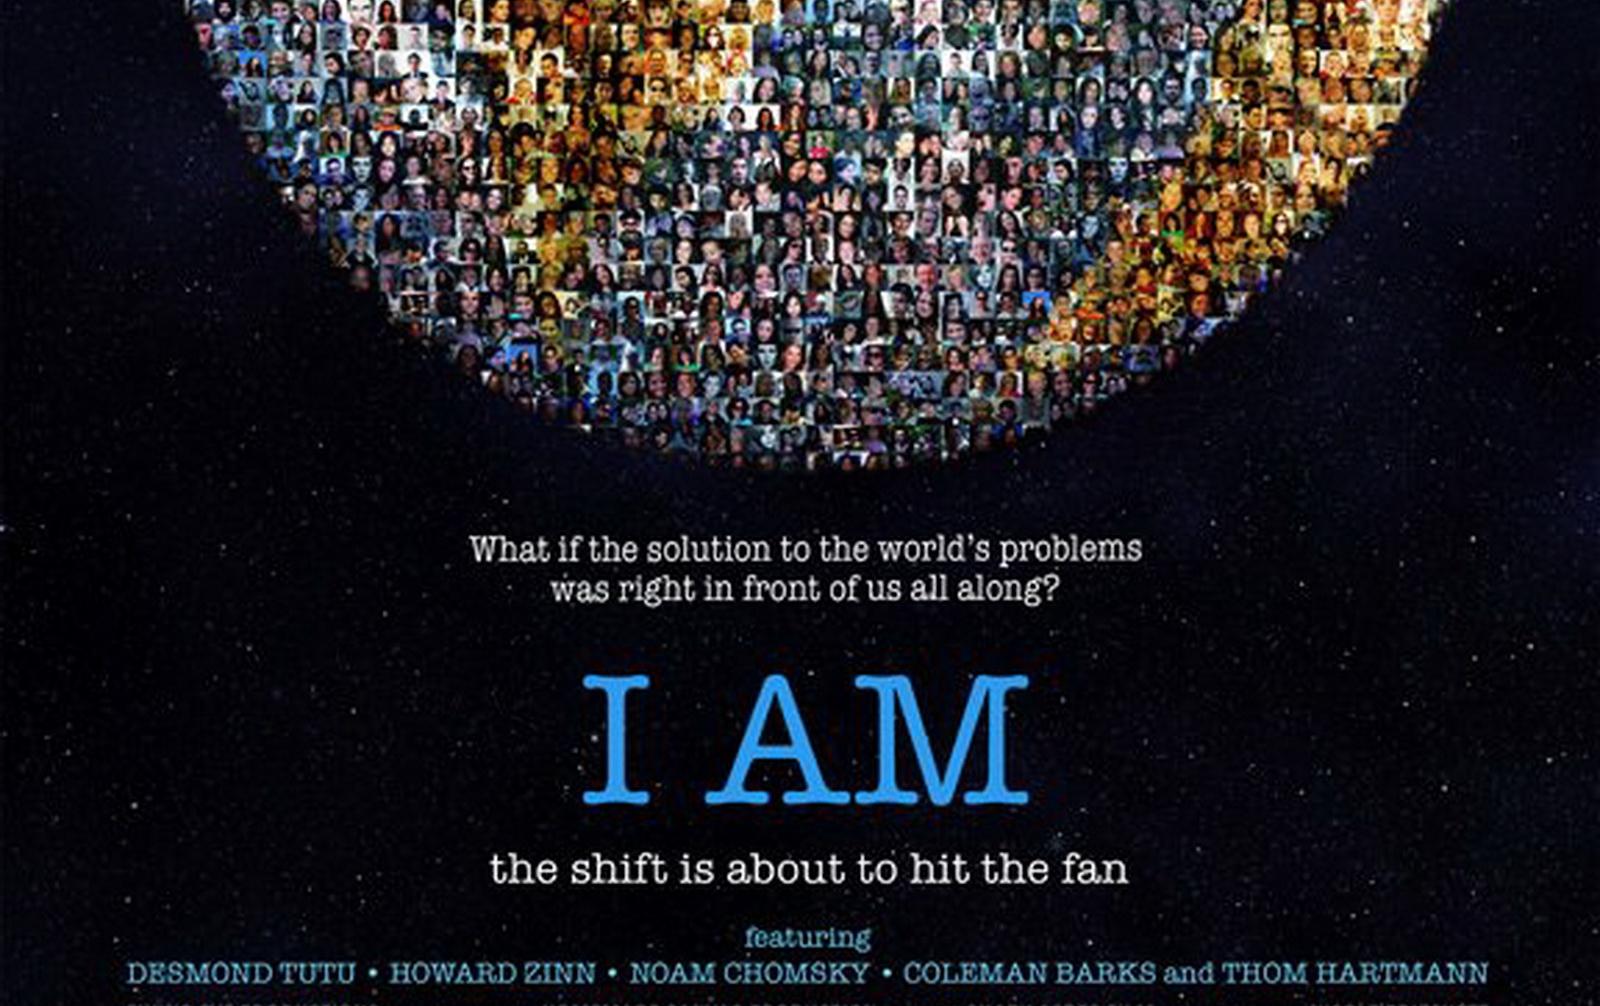 i-am-movie-1-298820.jpeg